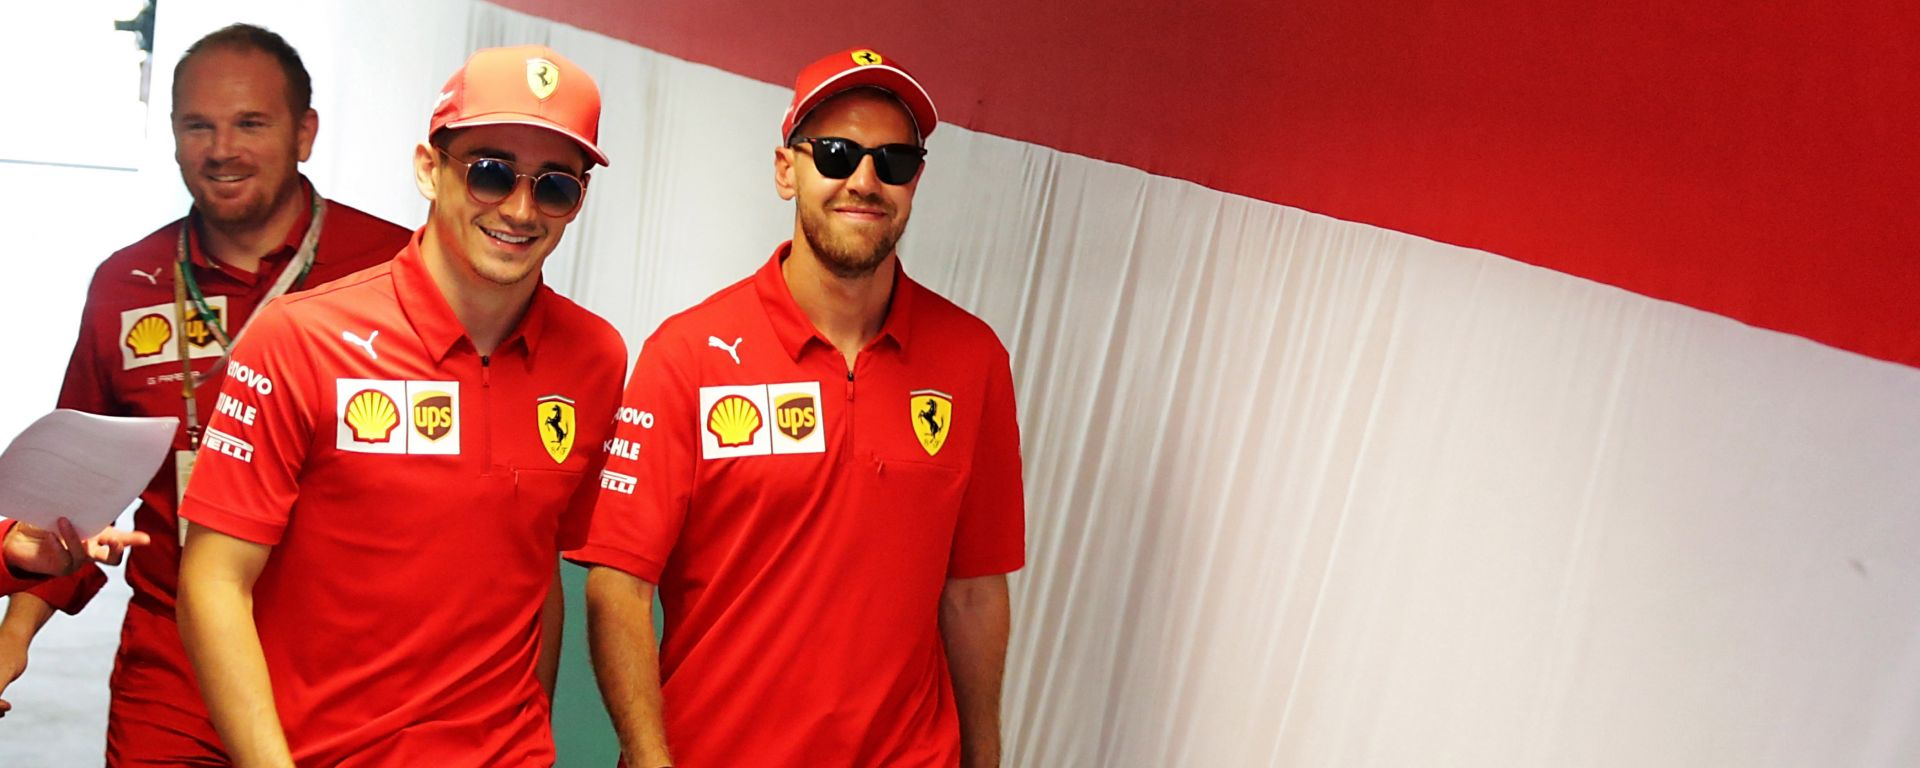 F1 GP Ungheria 2019, Charles Leclerc e Sebastian Vettel (Ferrari)